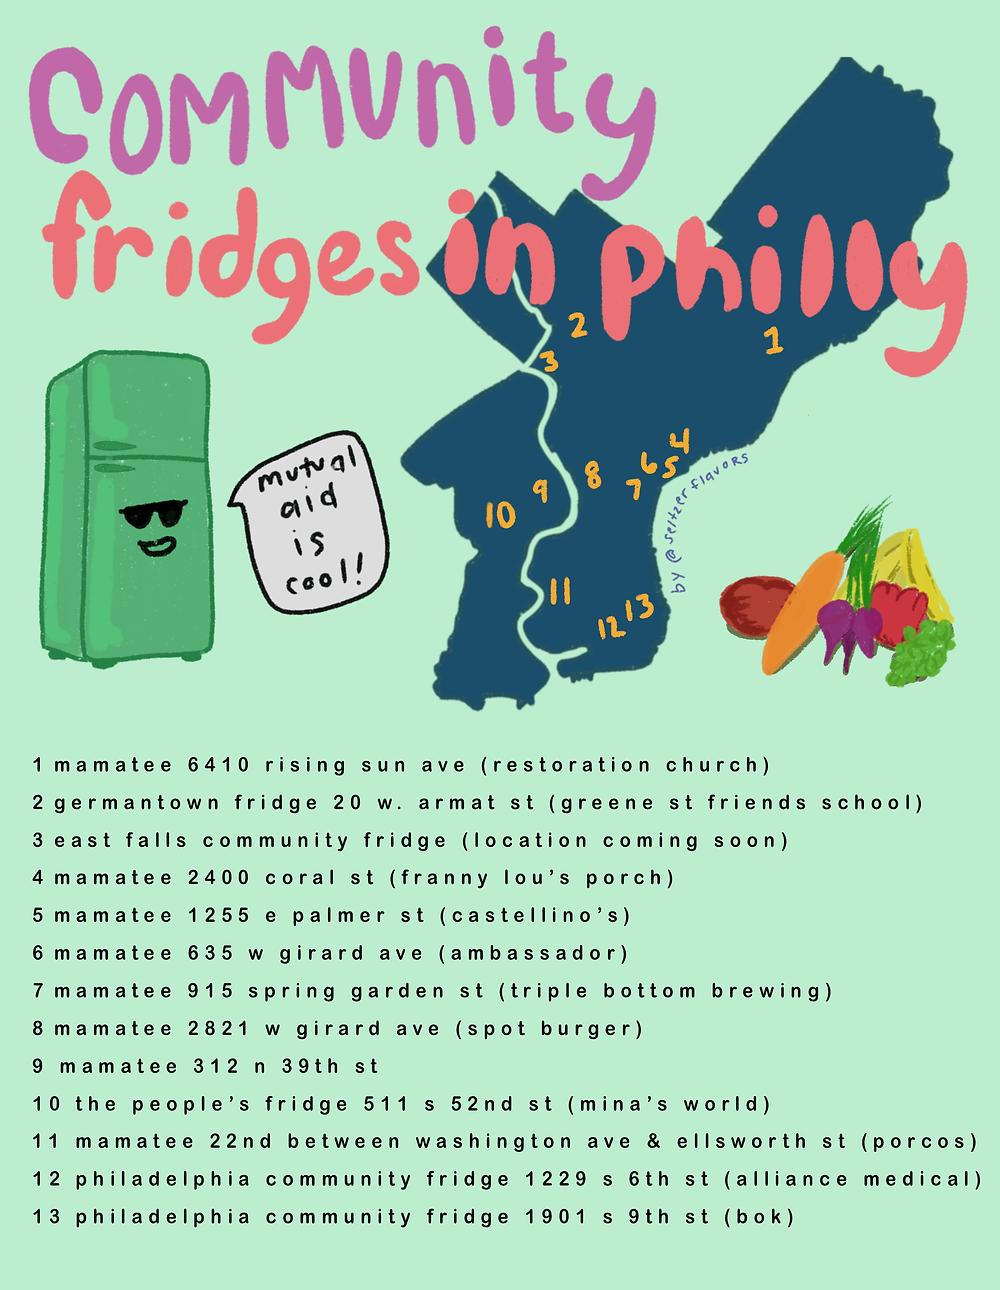 Community refrigerator map for Philadelphia highlighting where to find a fridge!